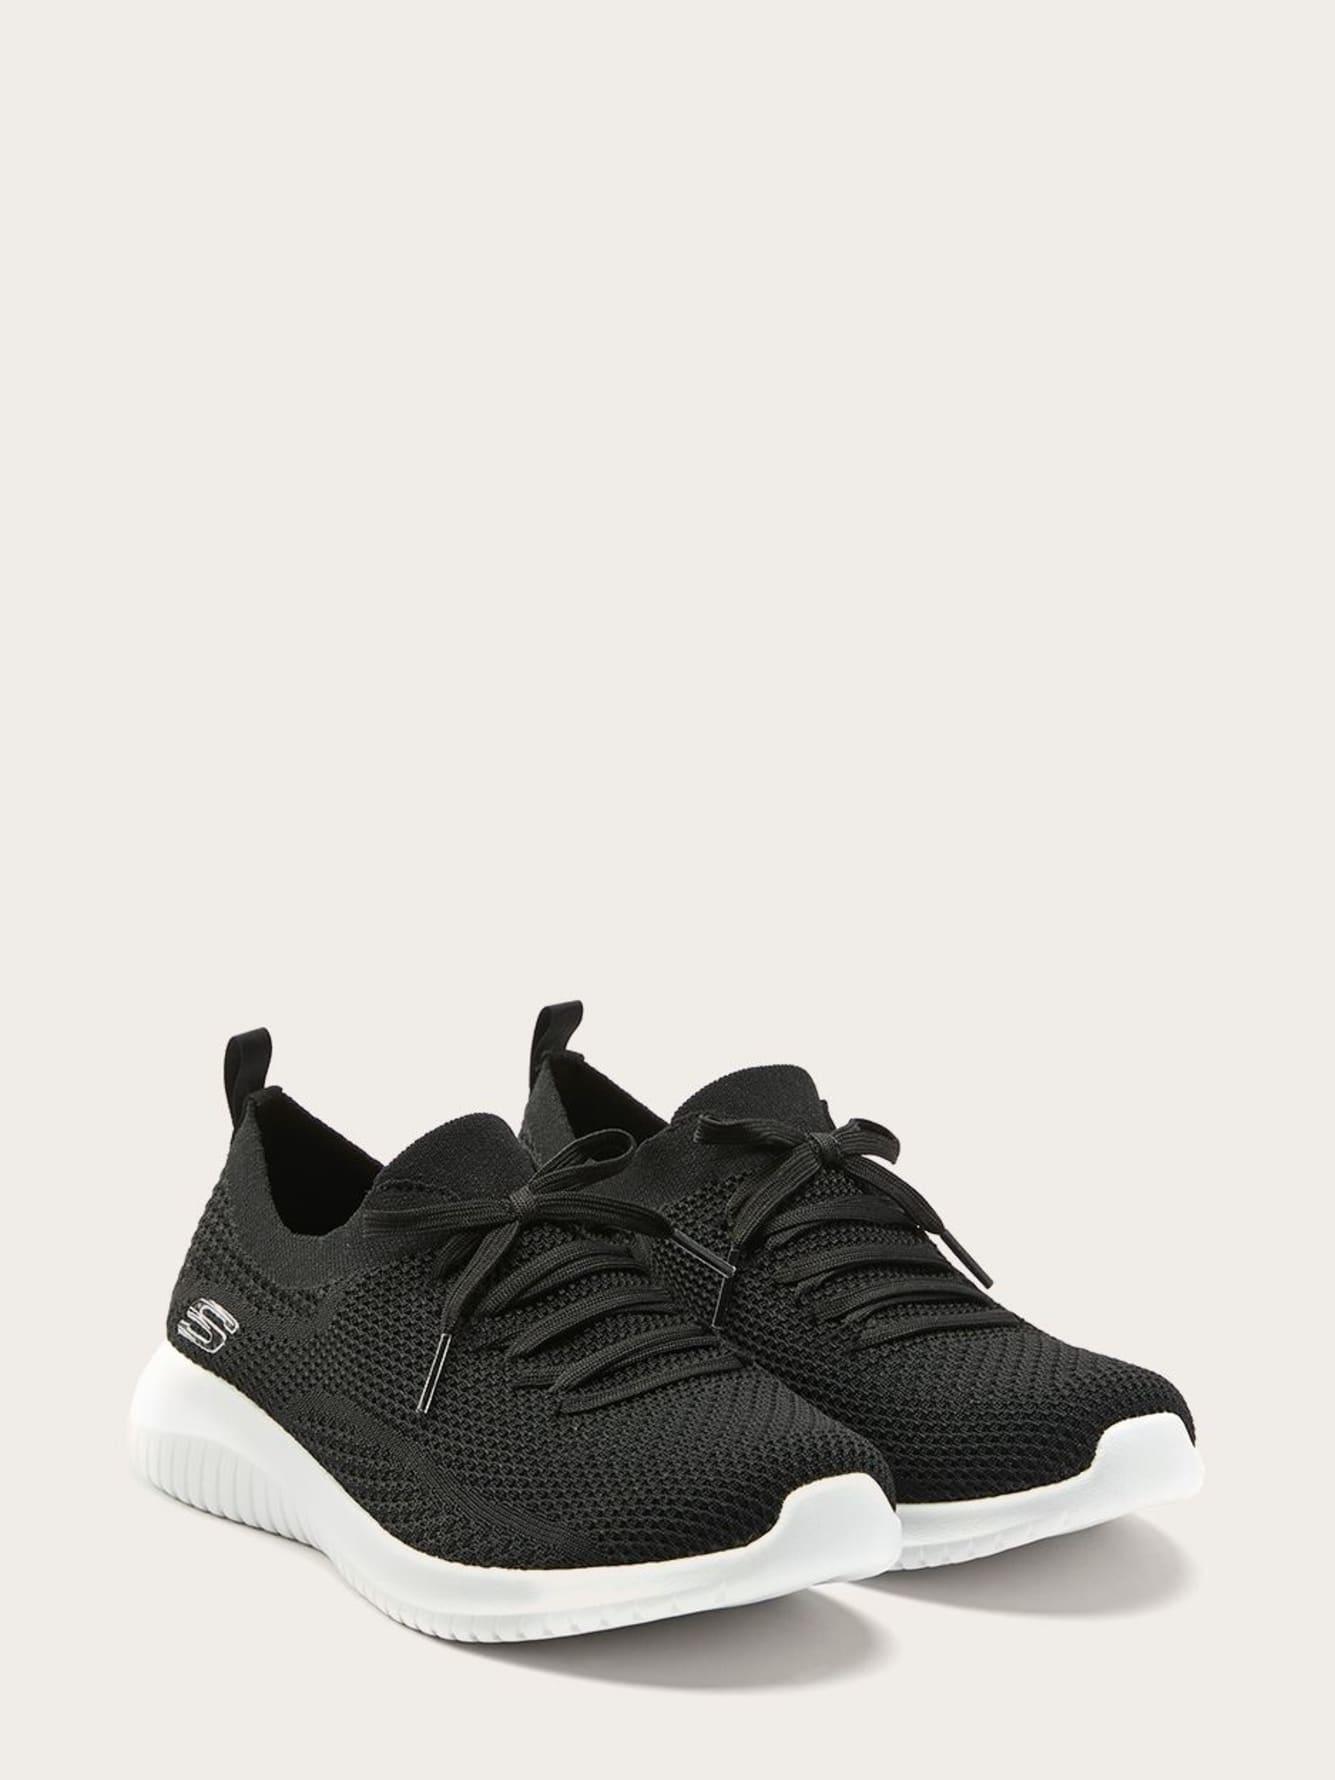 957b8231bdcd Wide-Width Slip On Sneakers with Laces - Skechers